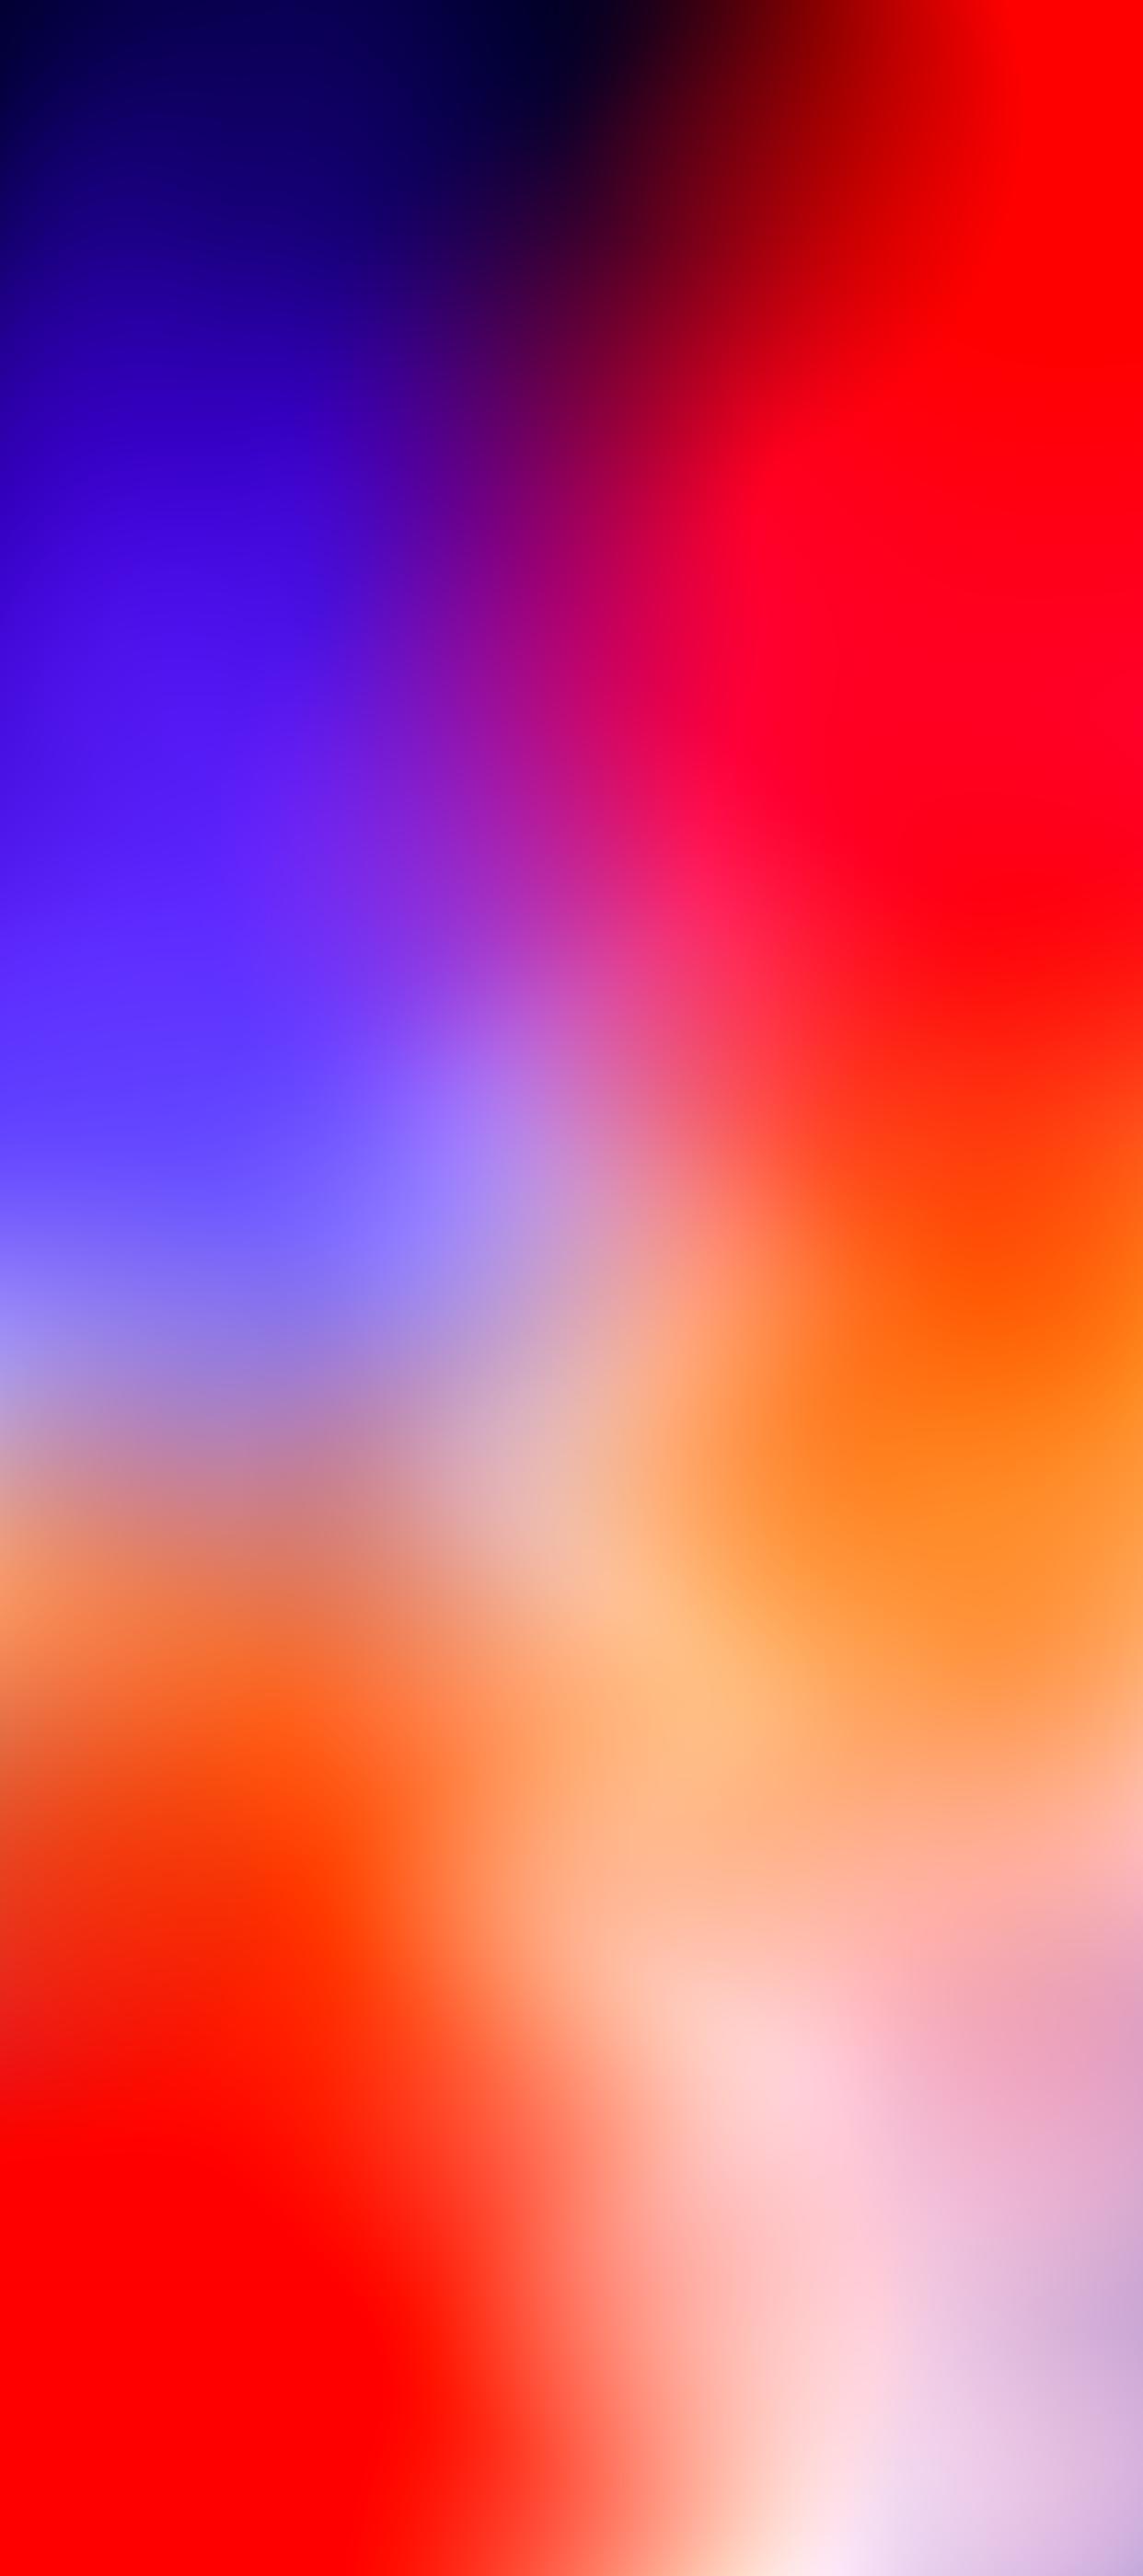 Iphone X Style Gradient By Evgeniyzemelko On Twitter In 2020 Color Wallpaper Iphone Apple Wallpaper Iphone Homescreen Wallpaper